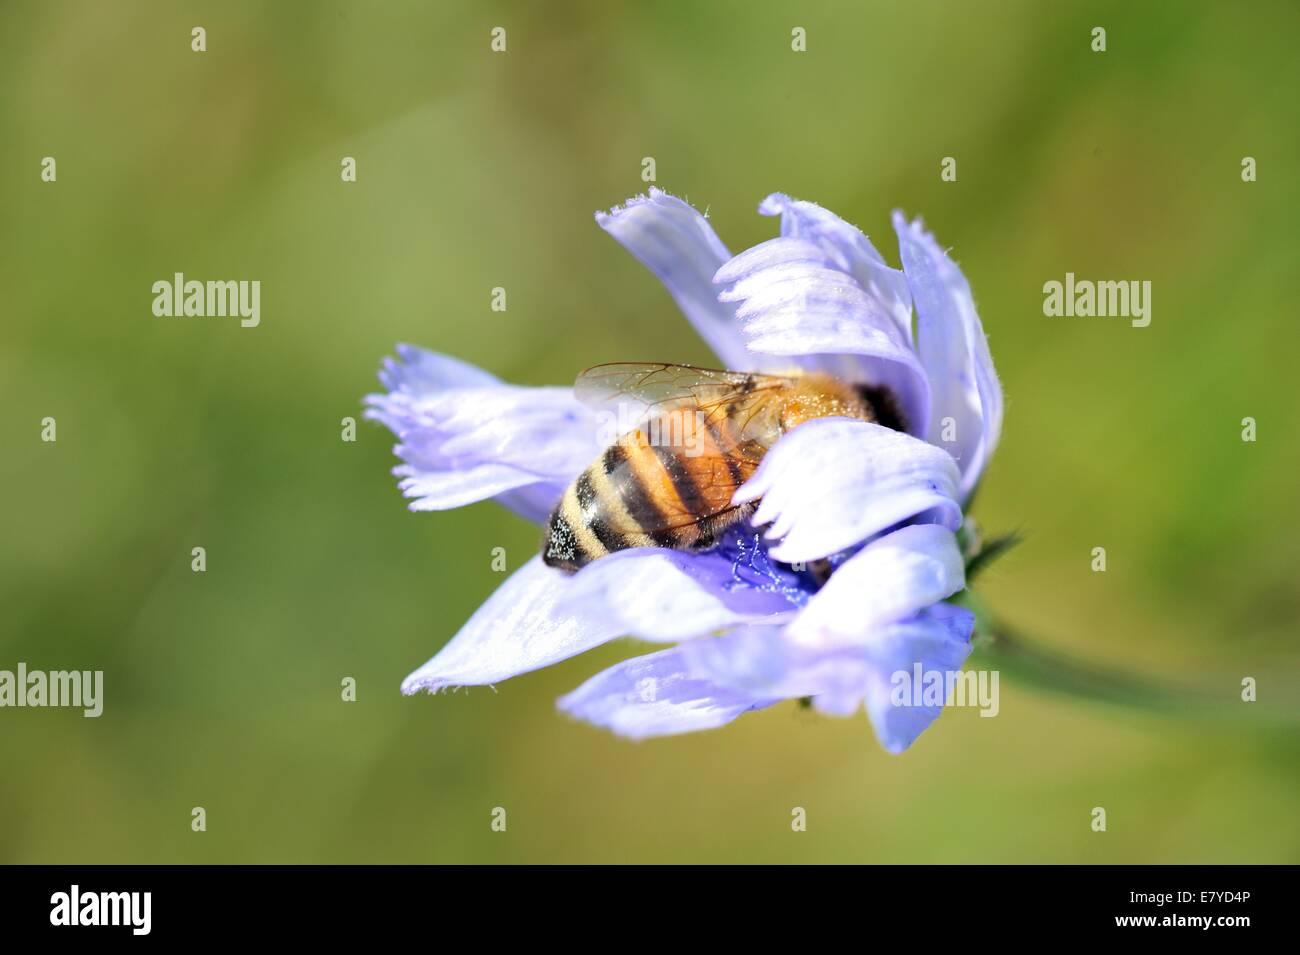 European honey bee inside a blue flower - Stock Image